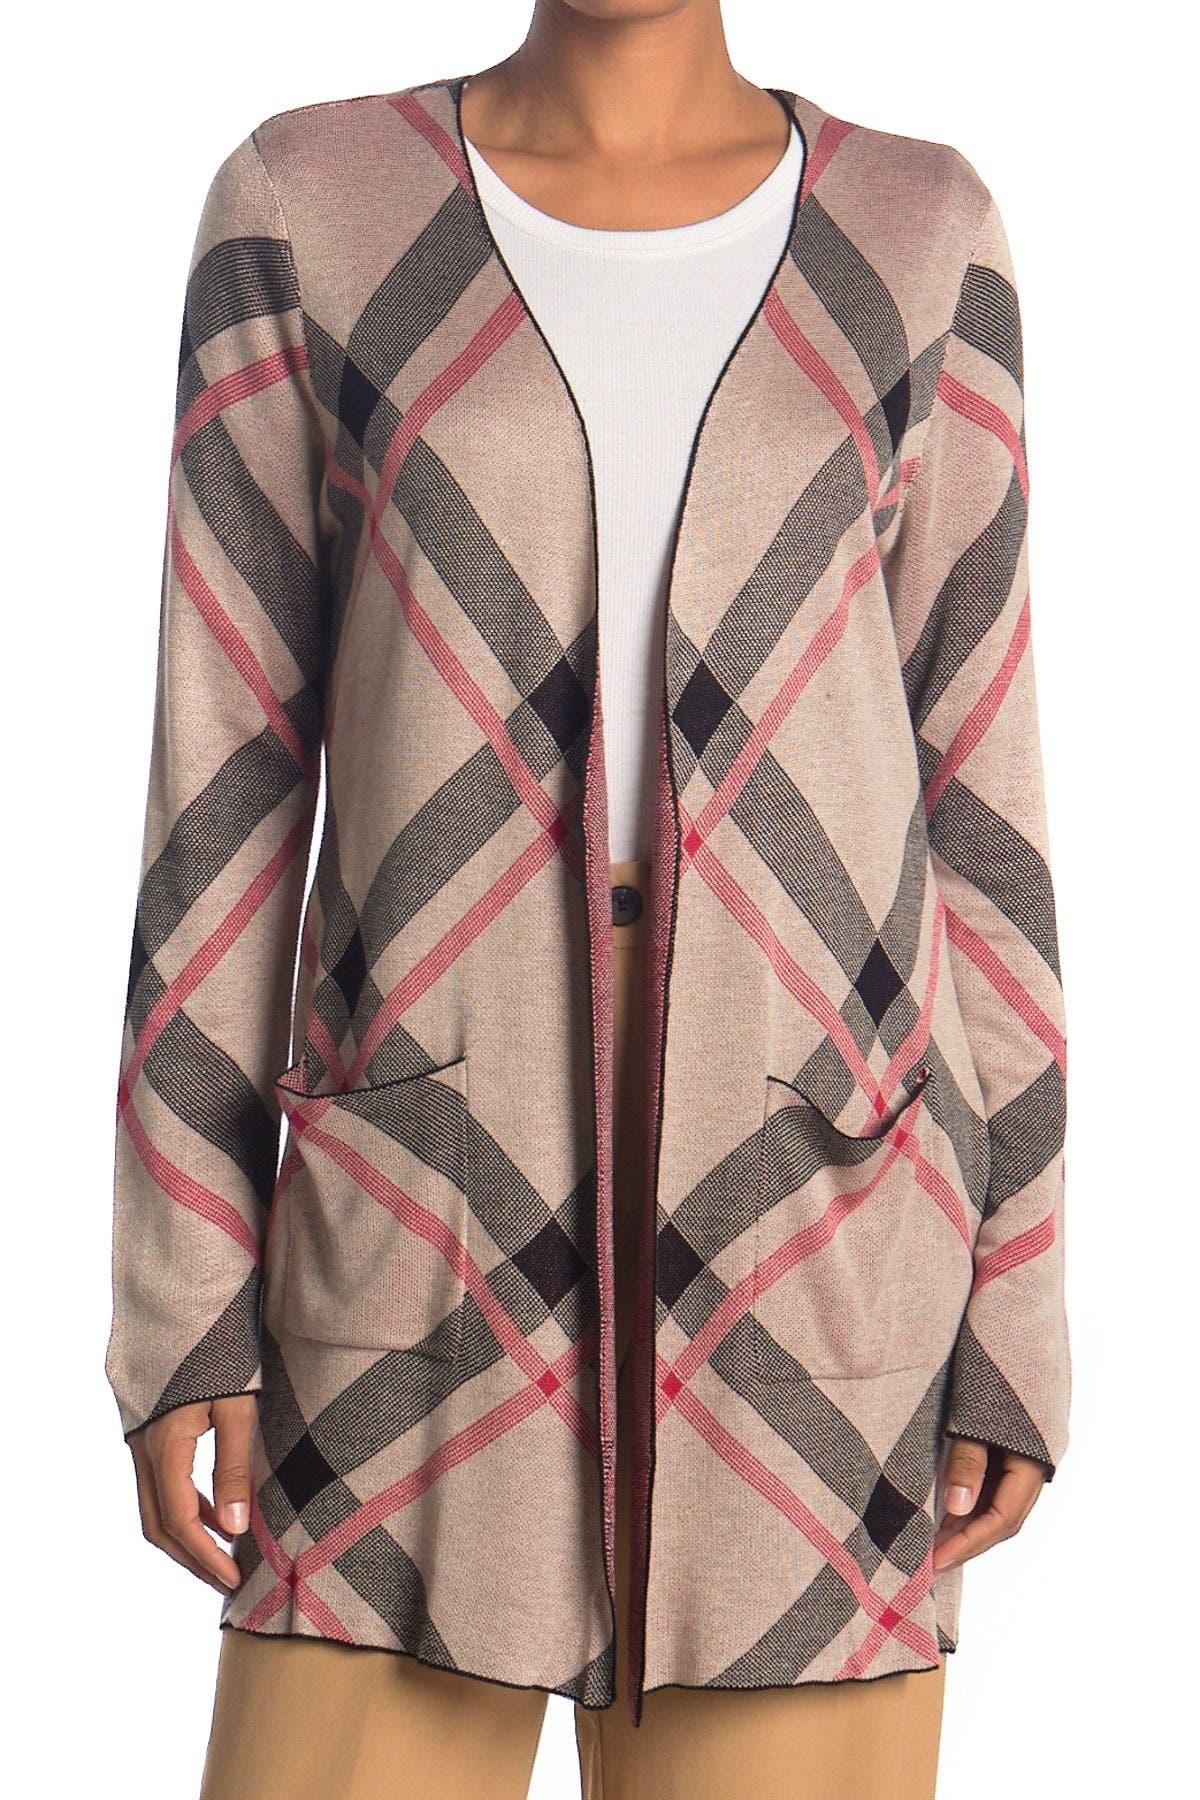 Image of JOSEPH A Lightweight Doubleknit Sweater